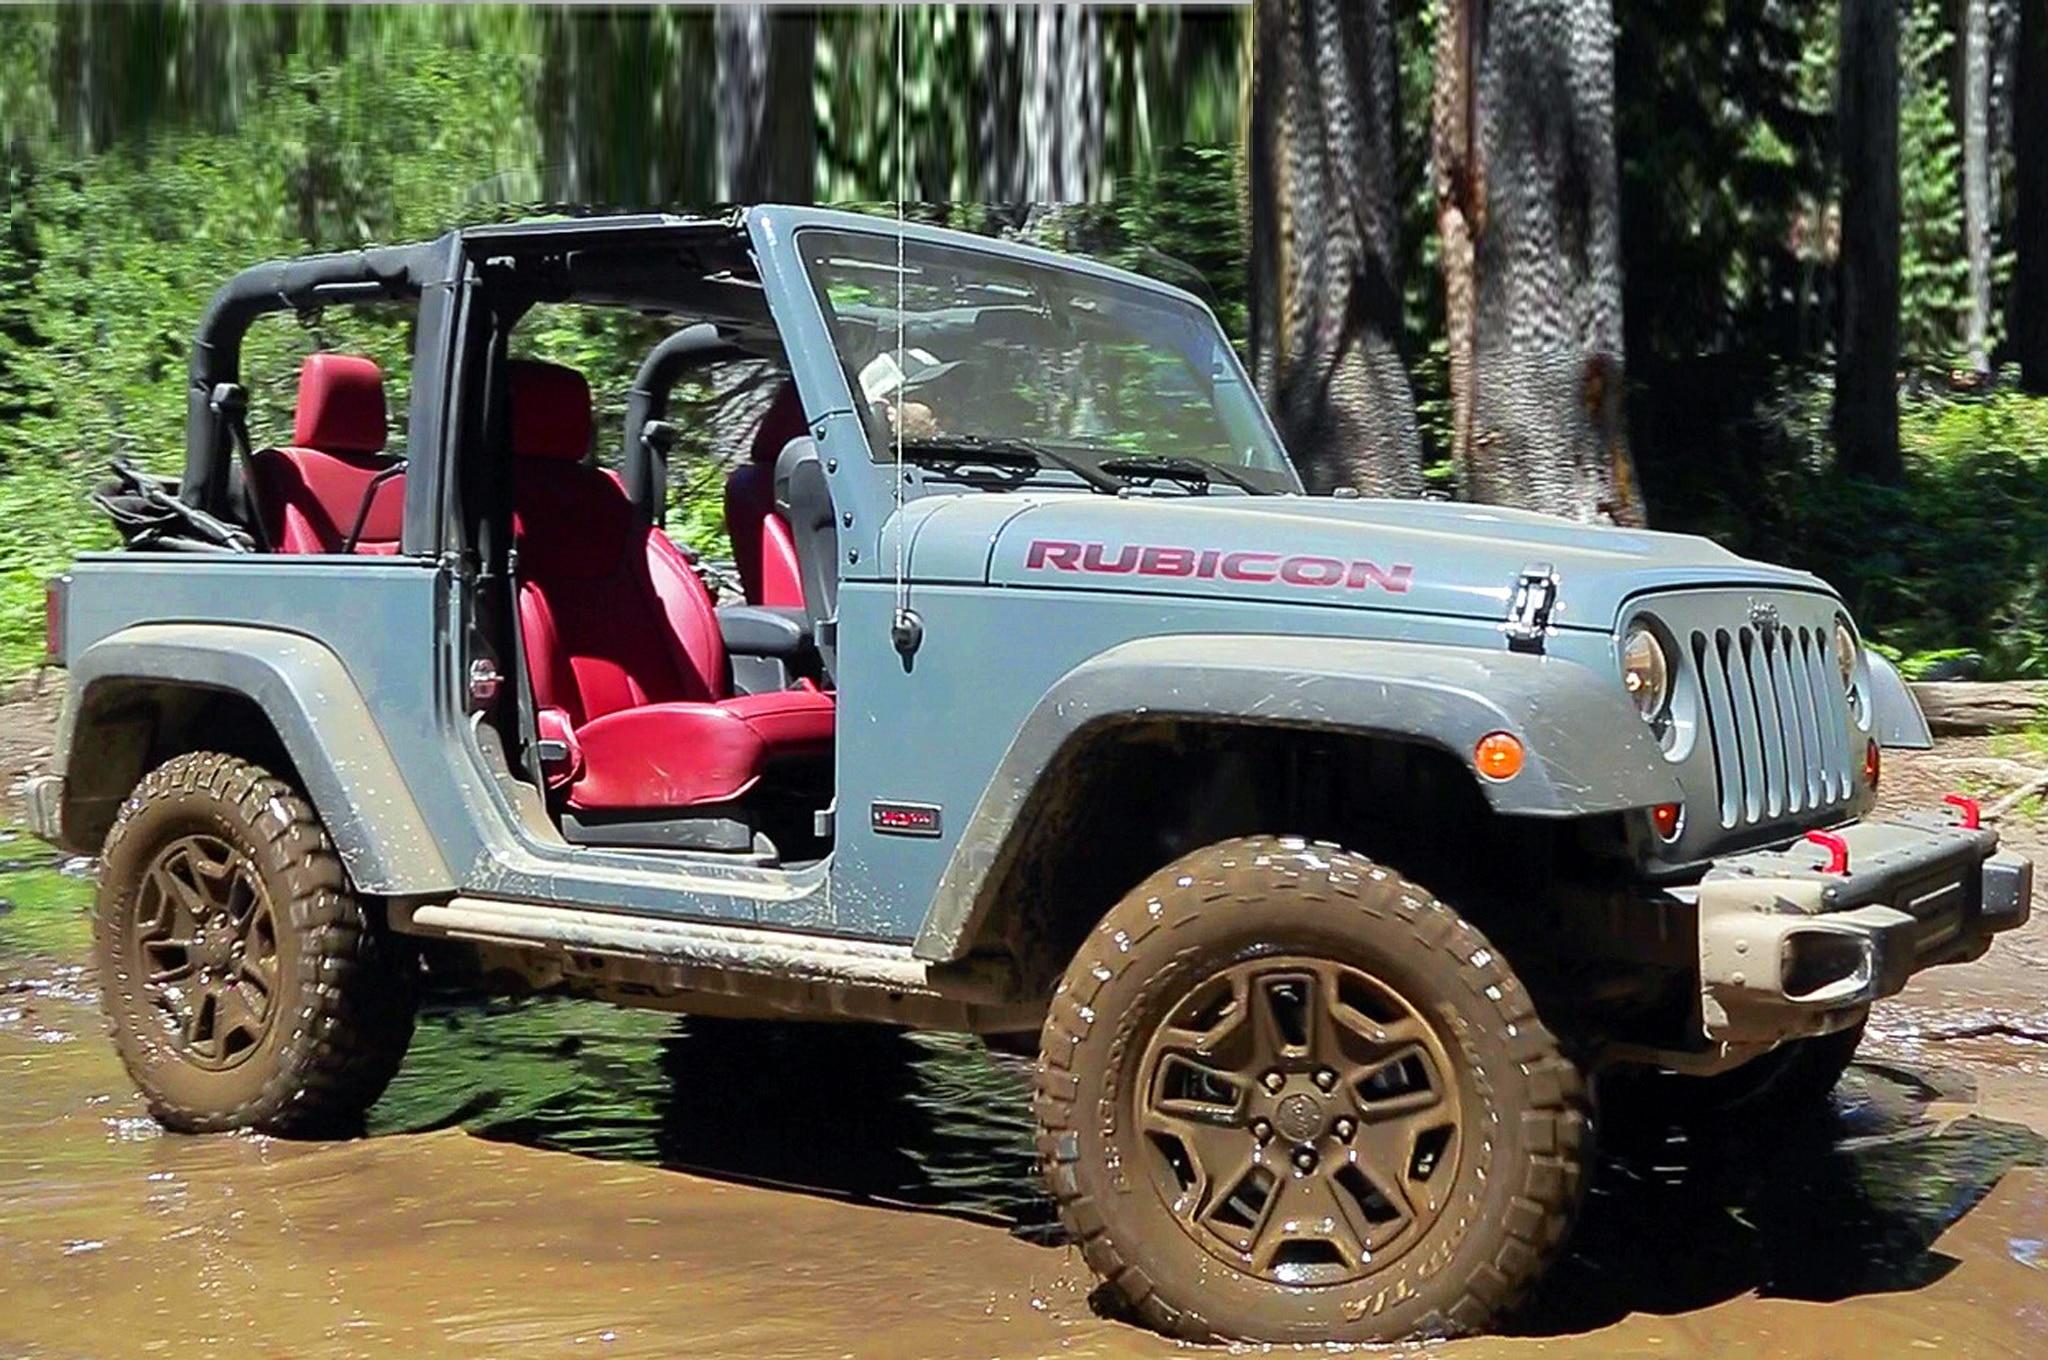 Fca Recalls 500 000 Jeep Wranglers For Airbag Deployment Error